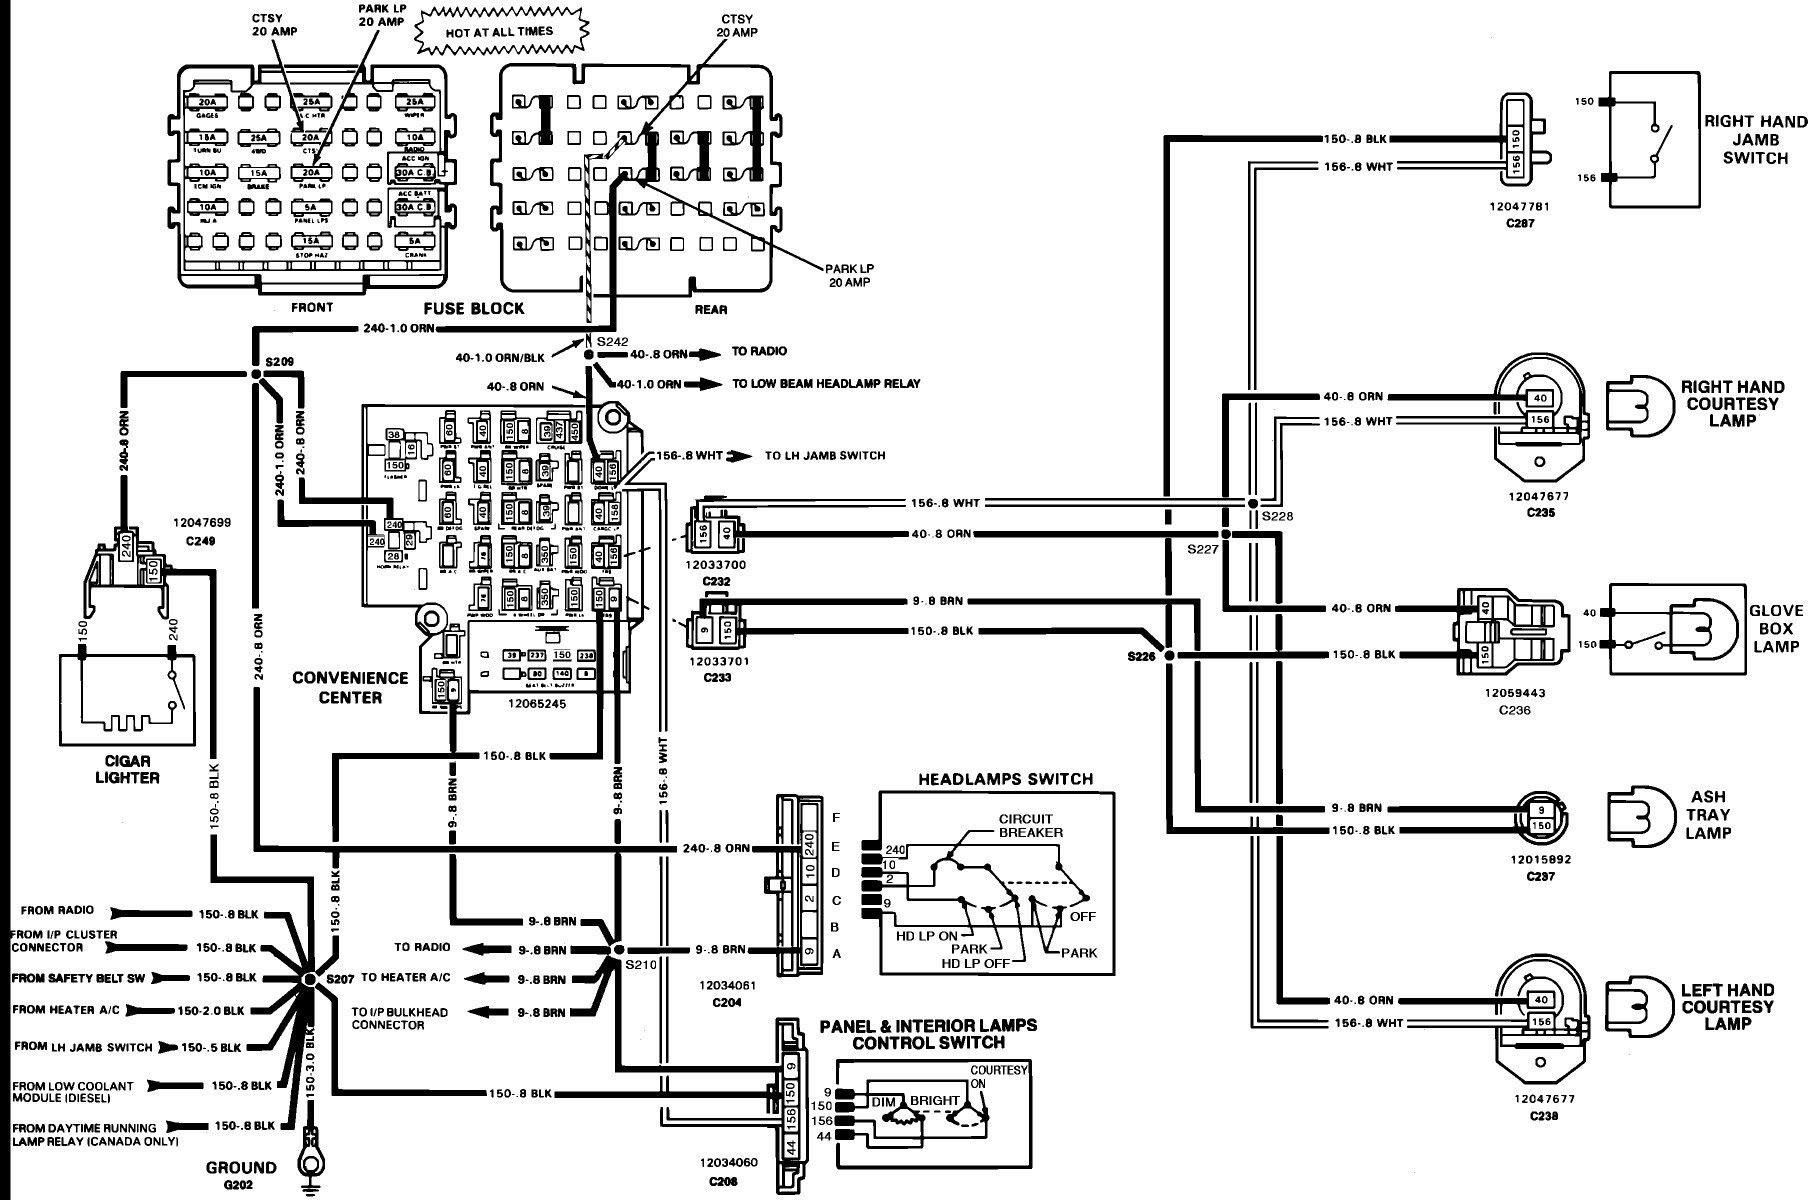 Luxury Wiring Diagram Of An Alternator Diagrams Digramssample Diagramimages Wiringdiagramsample Wiringdiagram Chevy S10 Electrical Diagram Chevy Trucks